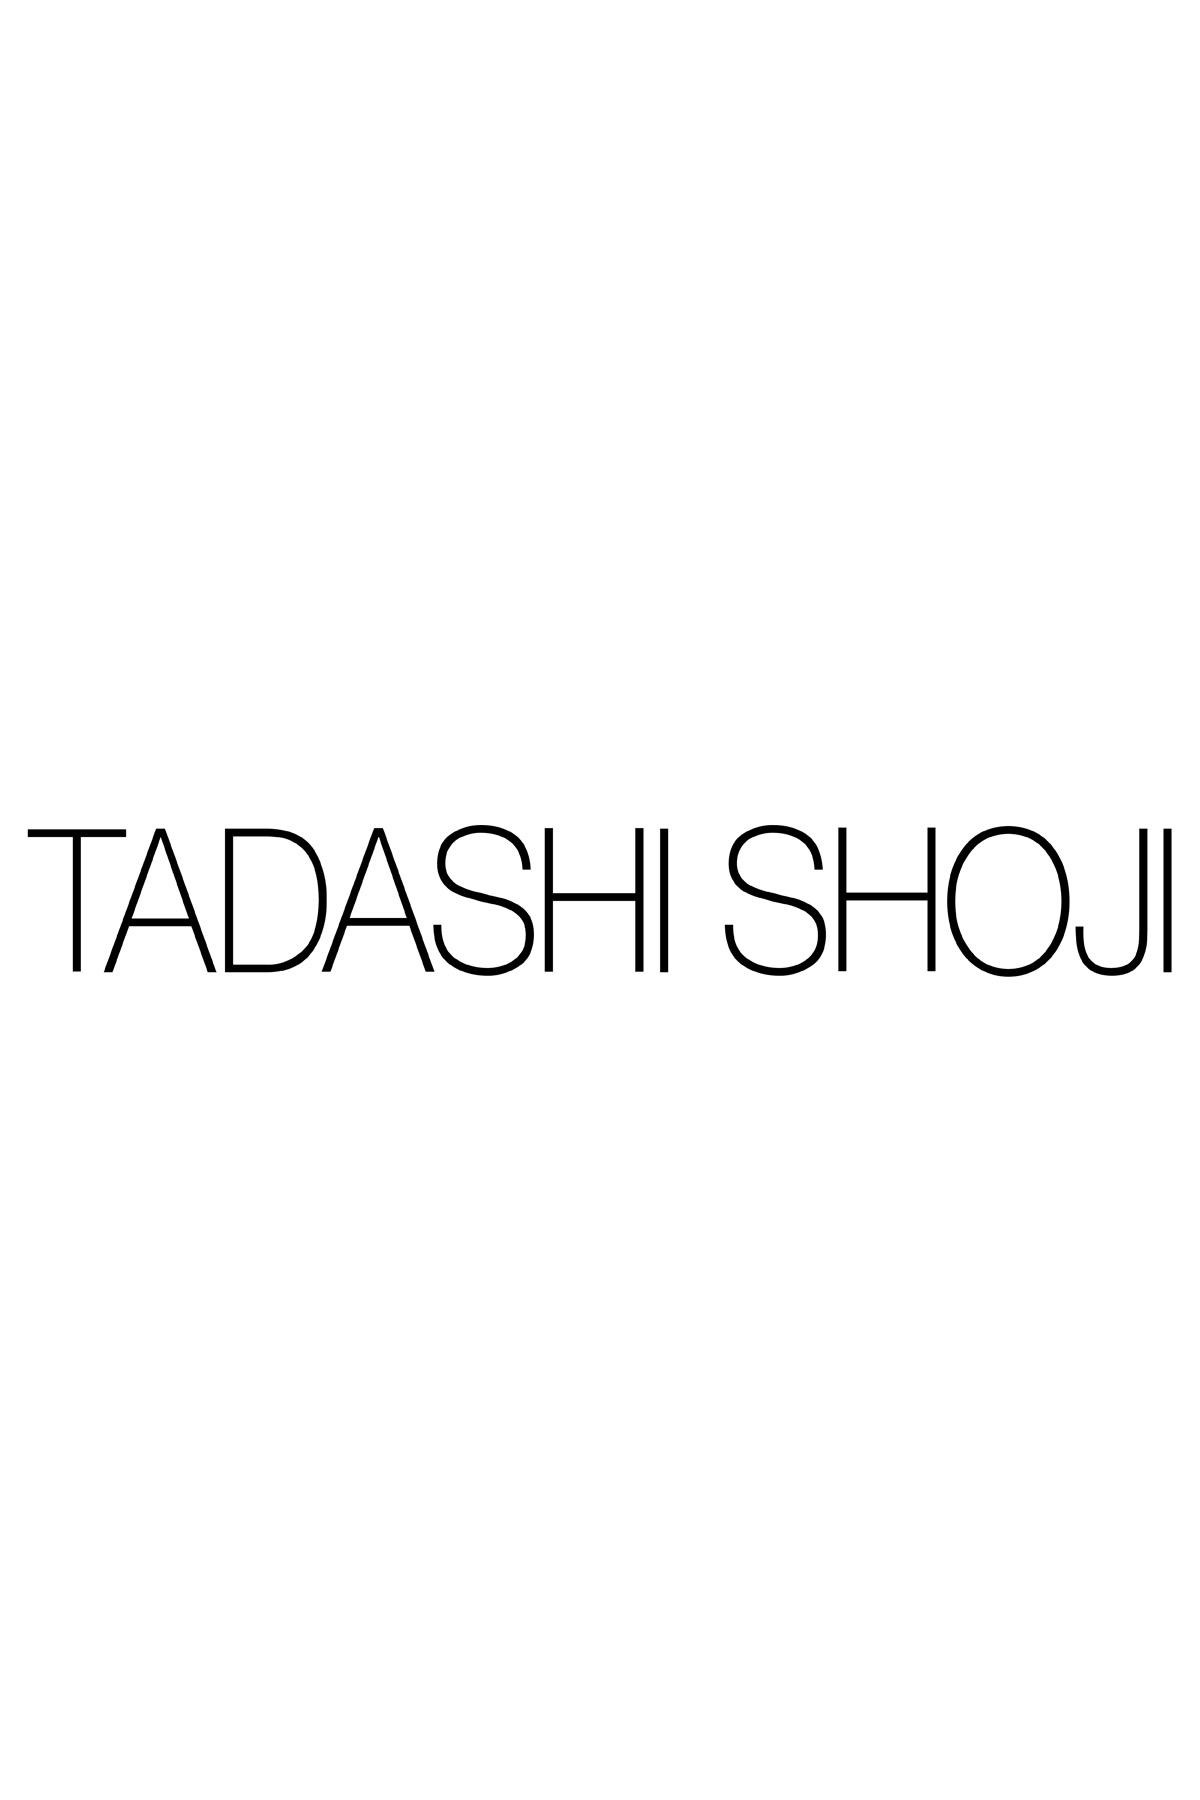 Tadashi Shoji - Corded Embroidery on Tulle Cap Sleeve Dress